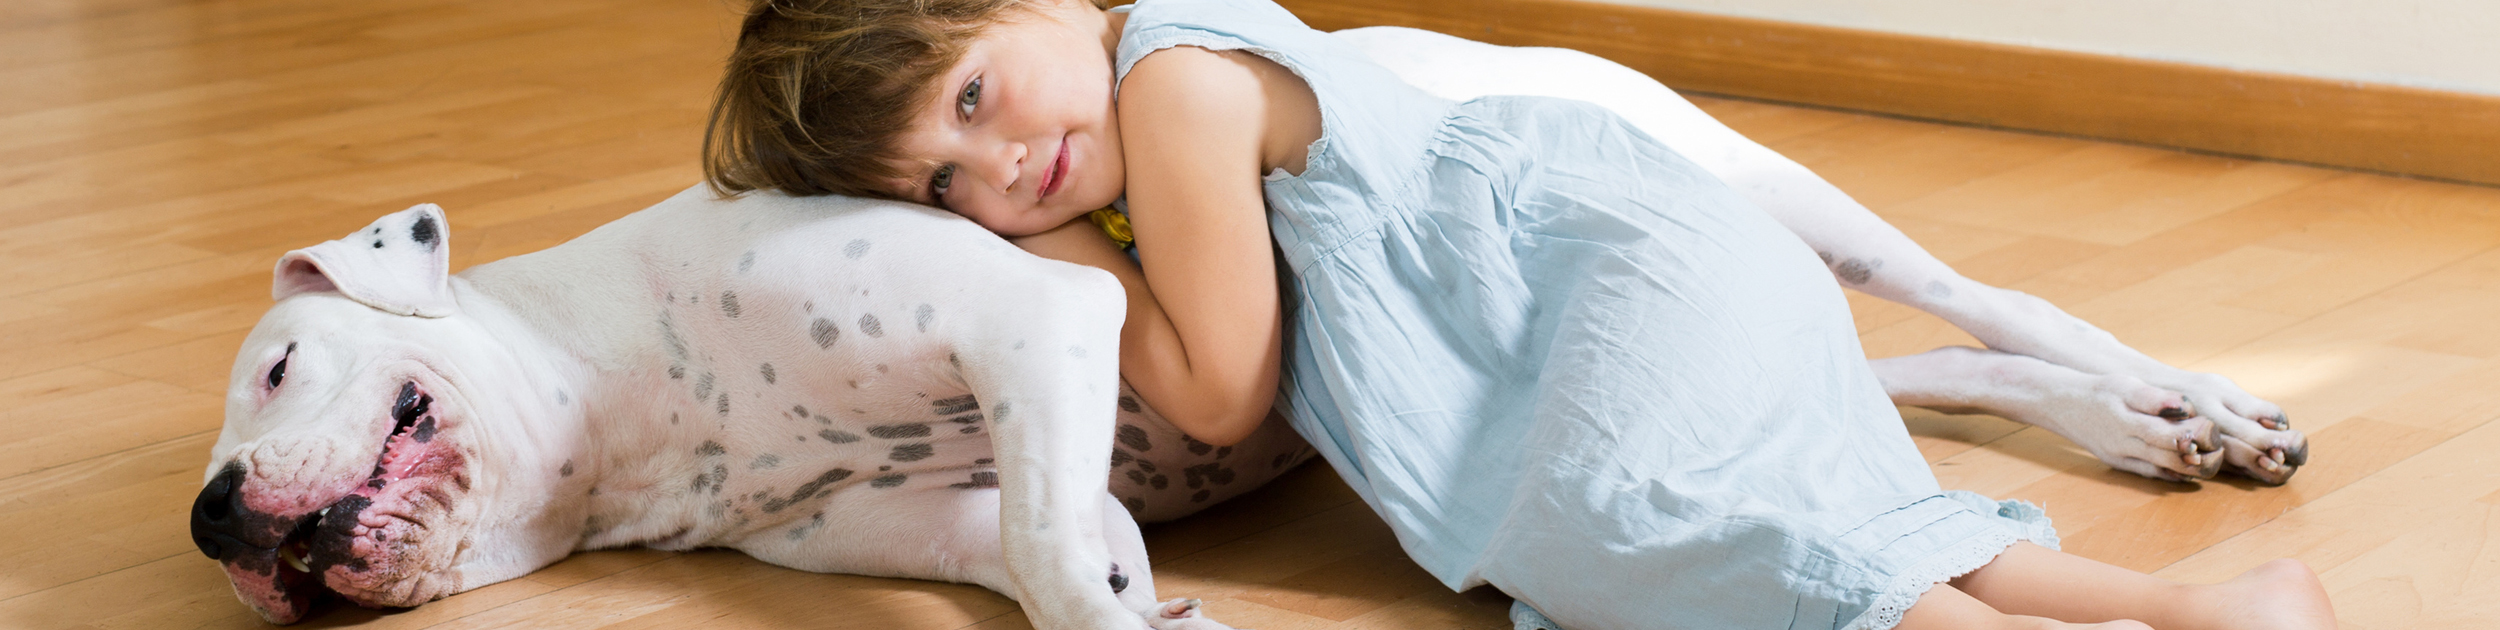 little girl laying on hard wood floor with dog